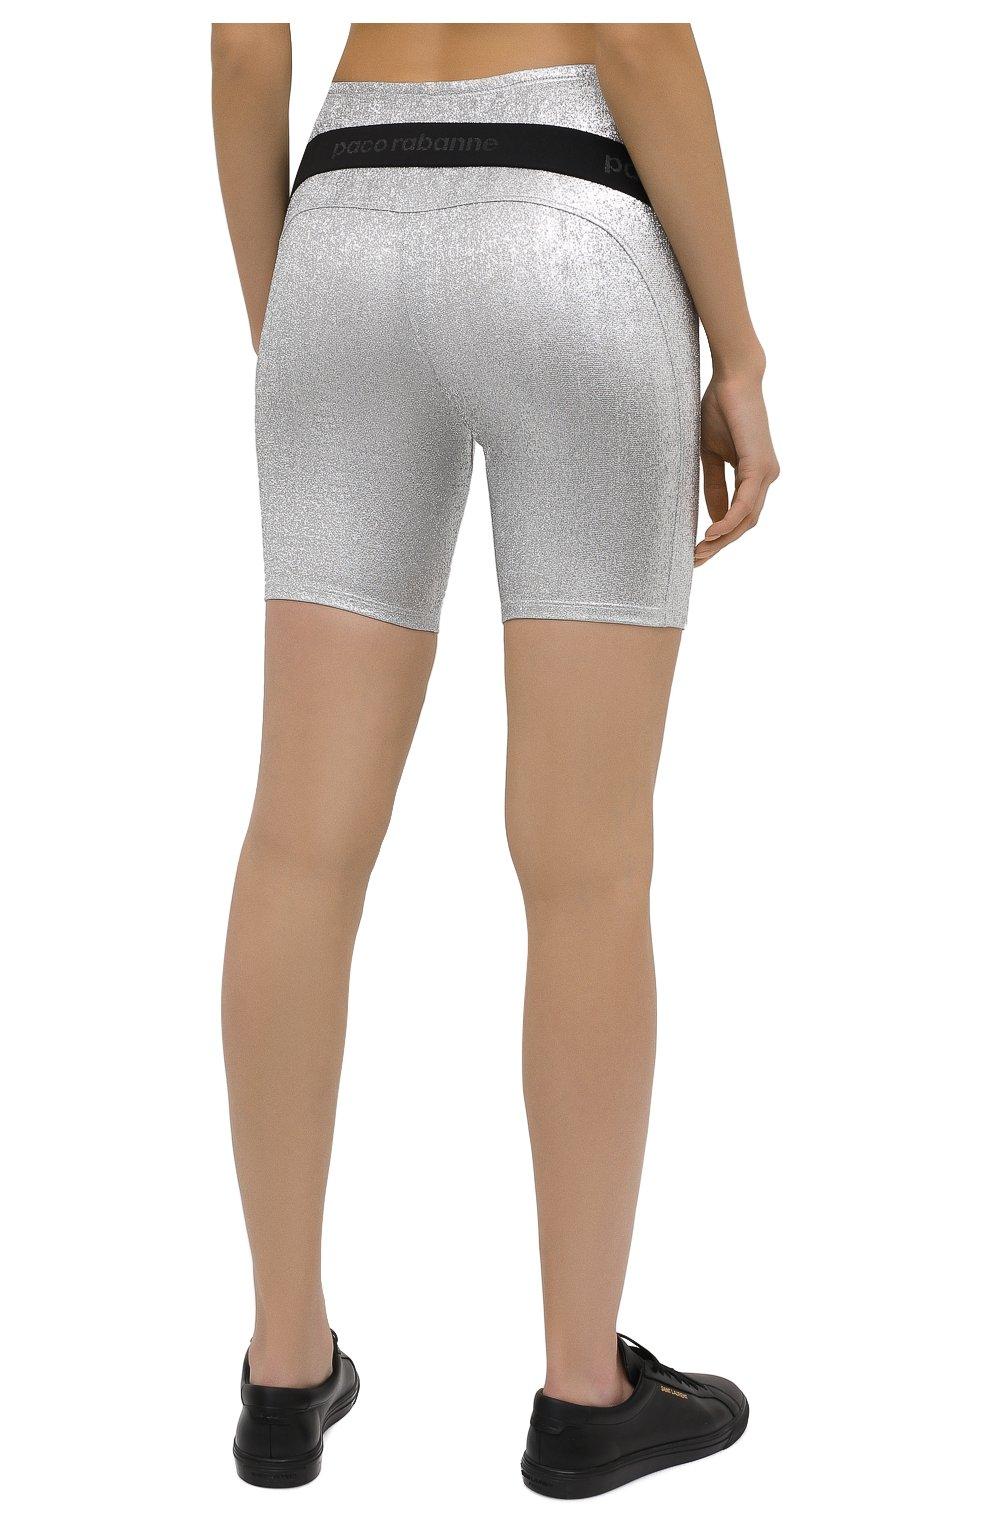 Женские шорты из вискозы PACO RABANNE серебряного цвета, арт. 20PJPA006VI0222 | Фото 4